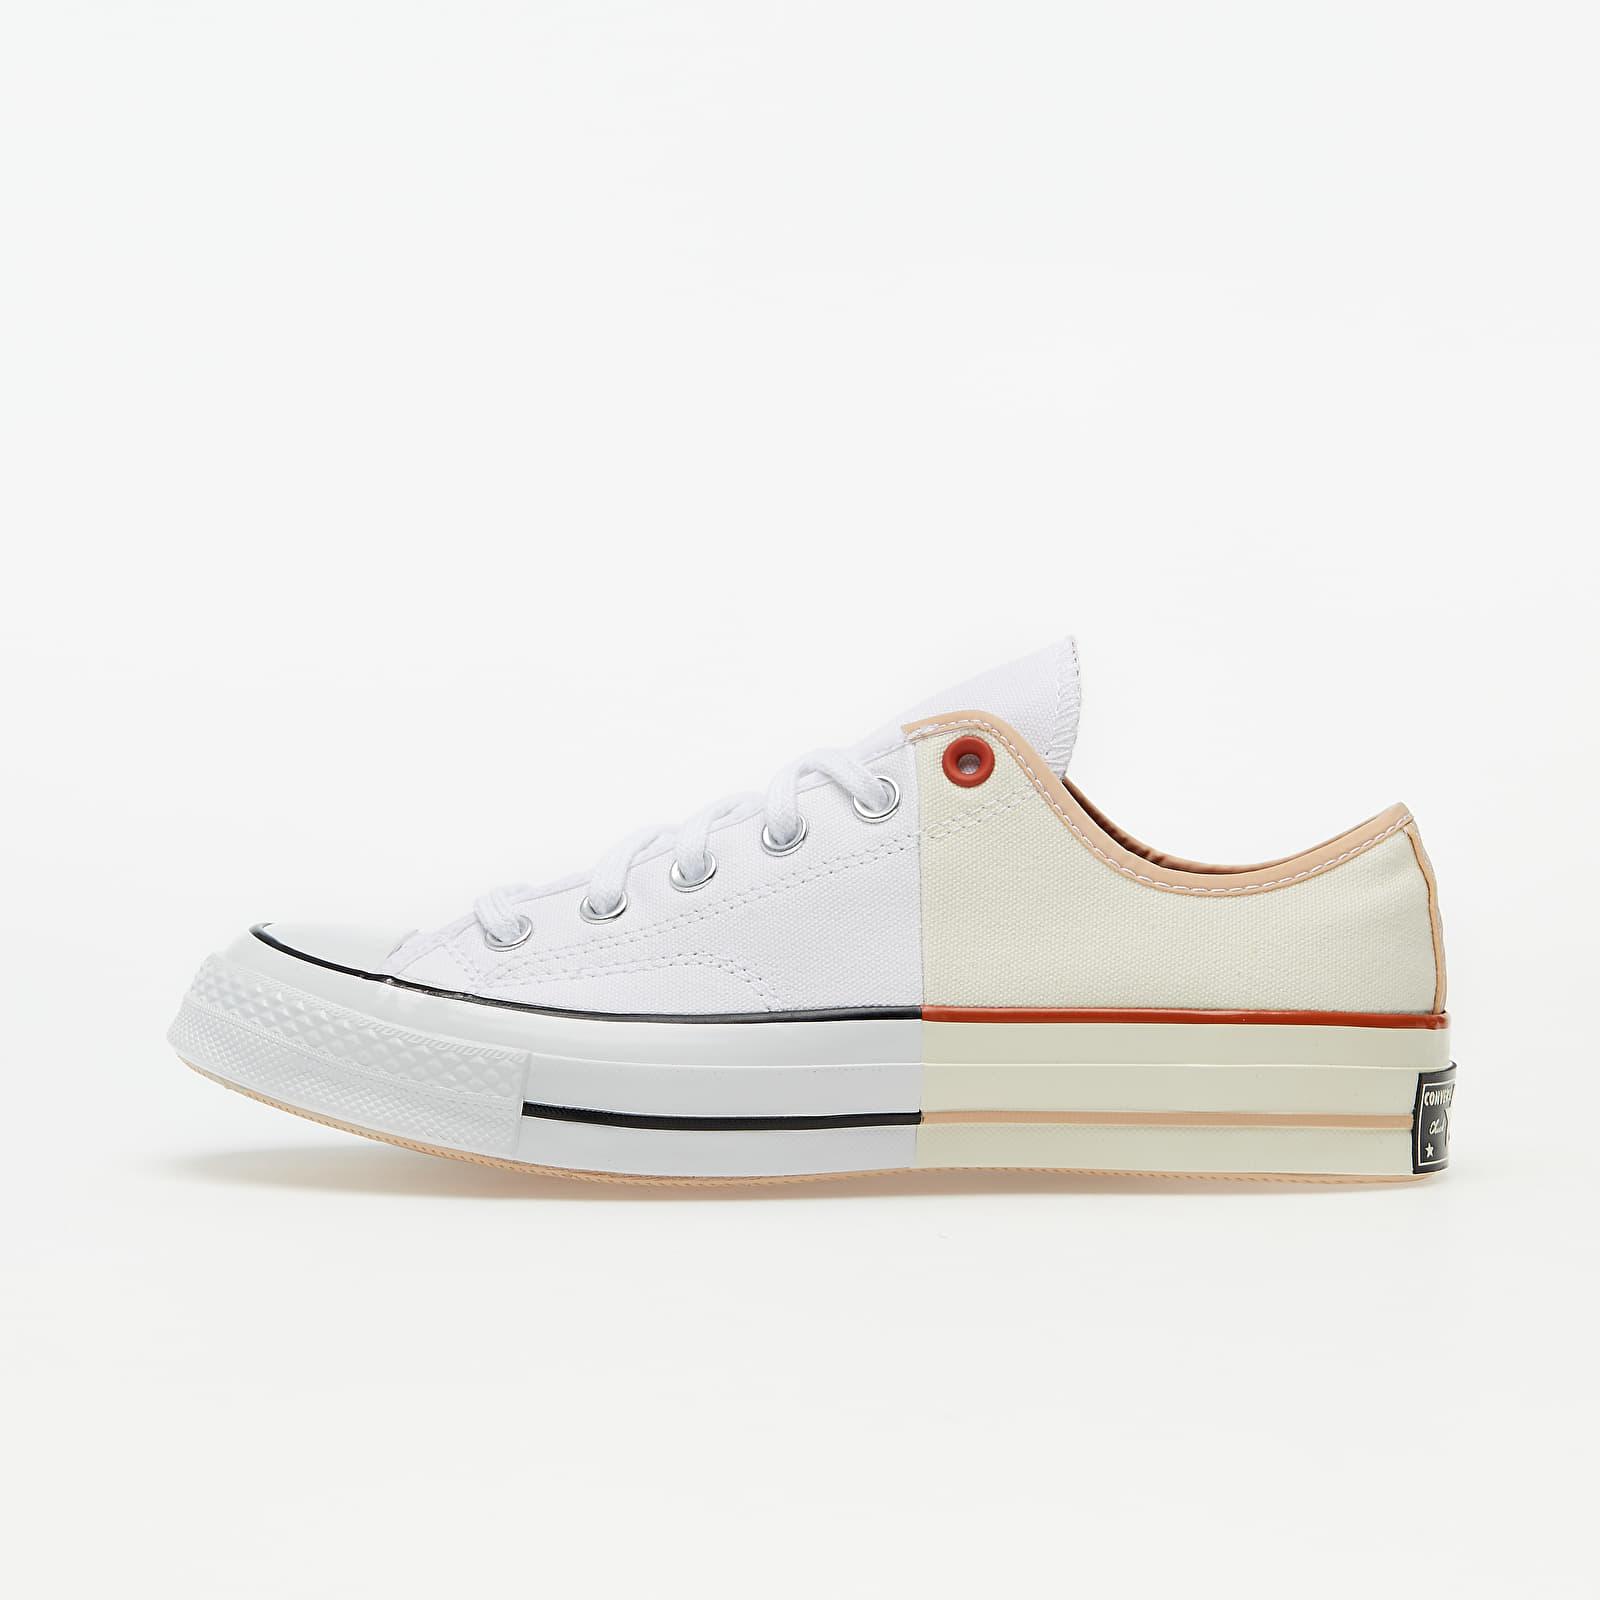 Men's shoes Converse Chuck 70 OX White/ Egret/ Shimmer